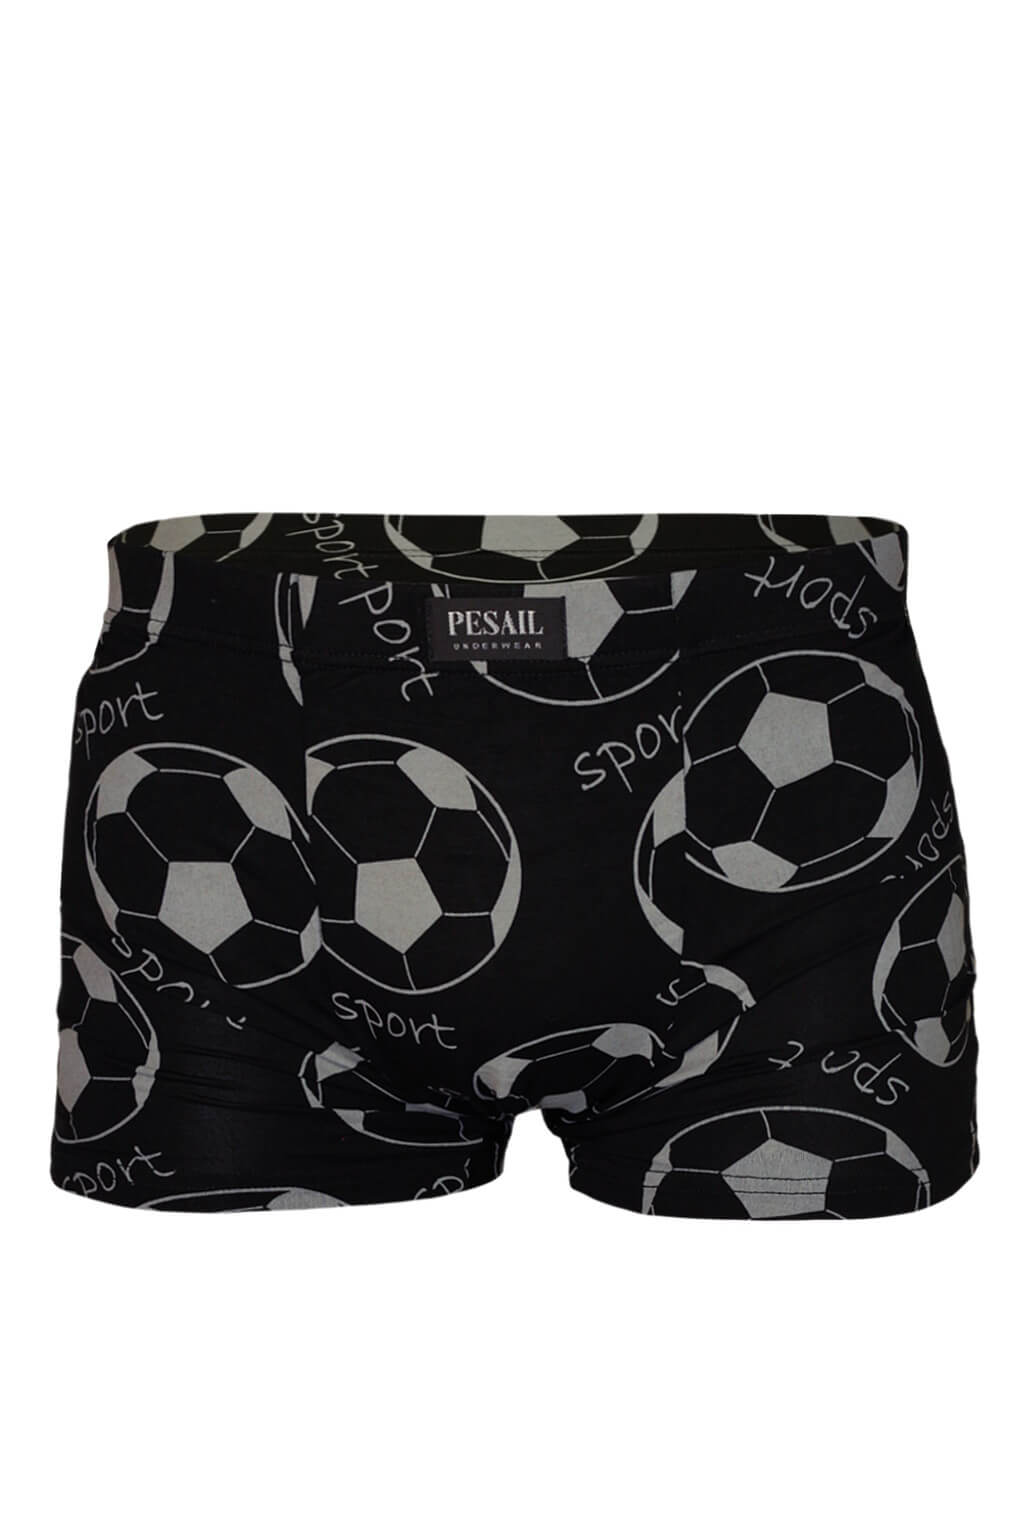 Ronaldo boxerky prádlo z bambusu XXL šedá